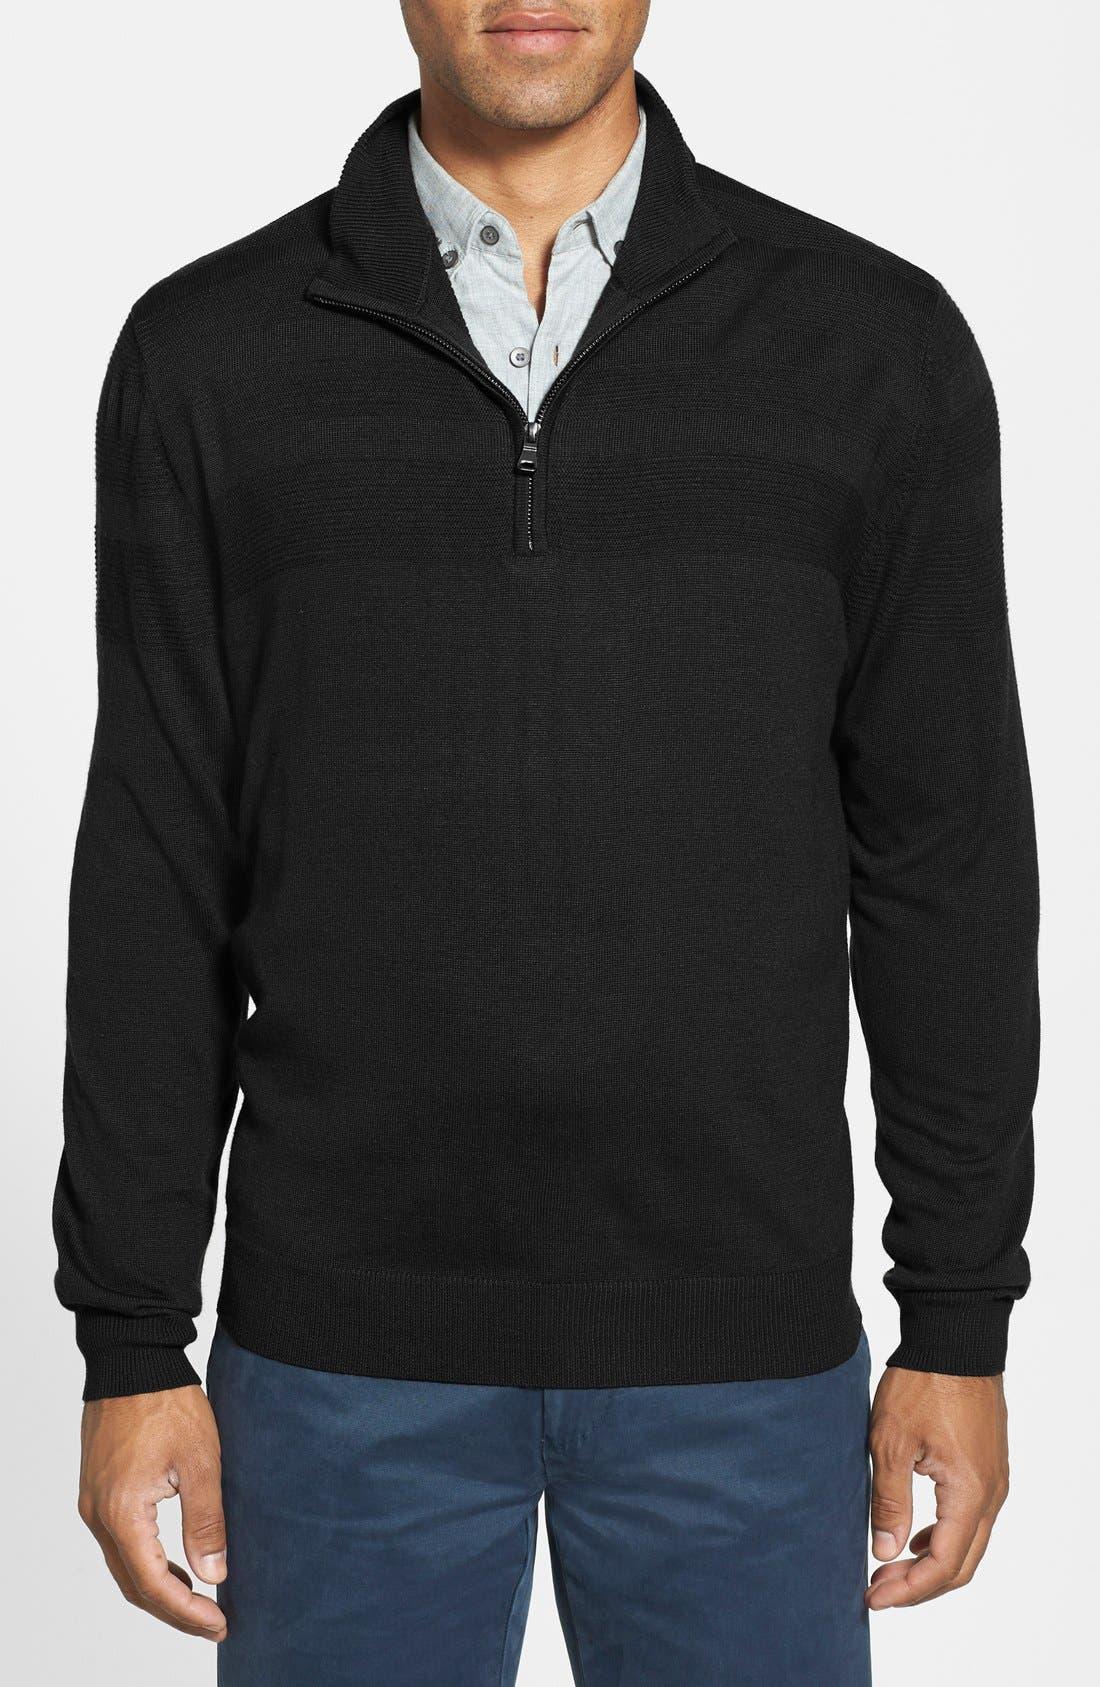 Alternate Image 1 Selected - Cutter & Buck 'Douglas' Merino Wool Blend Half Zip Sweater (Big & Tall)